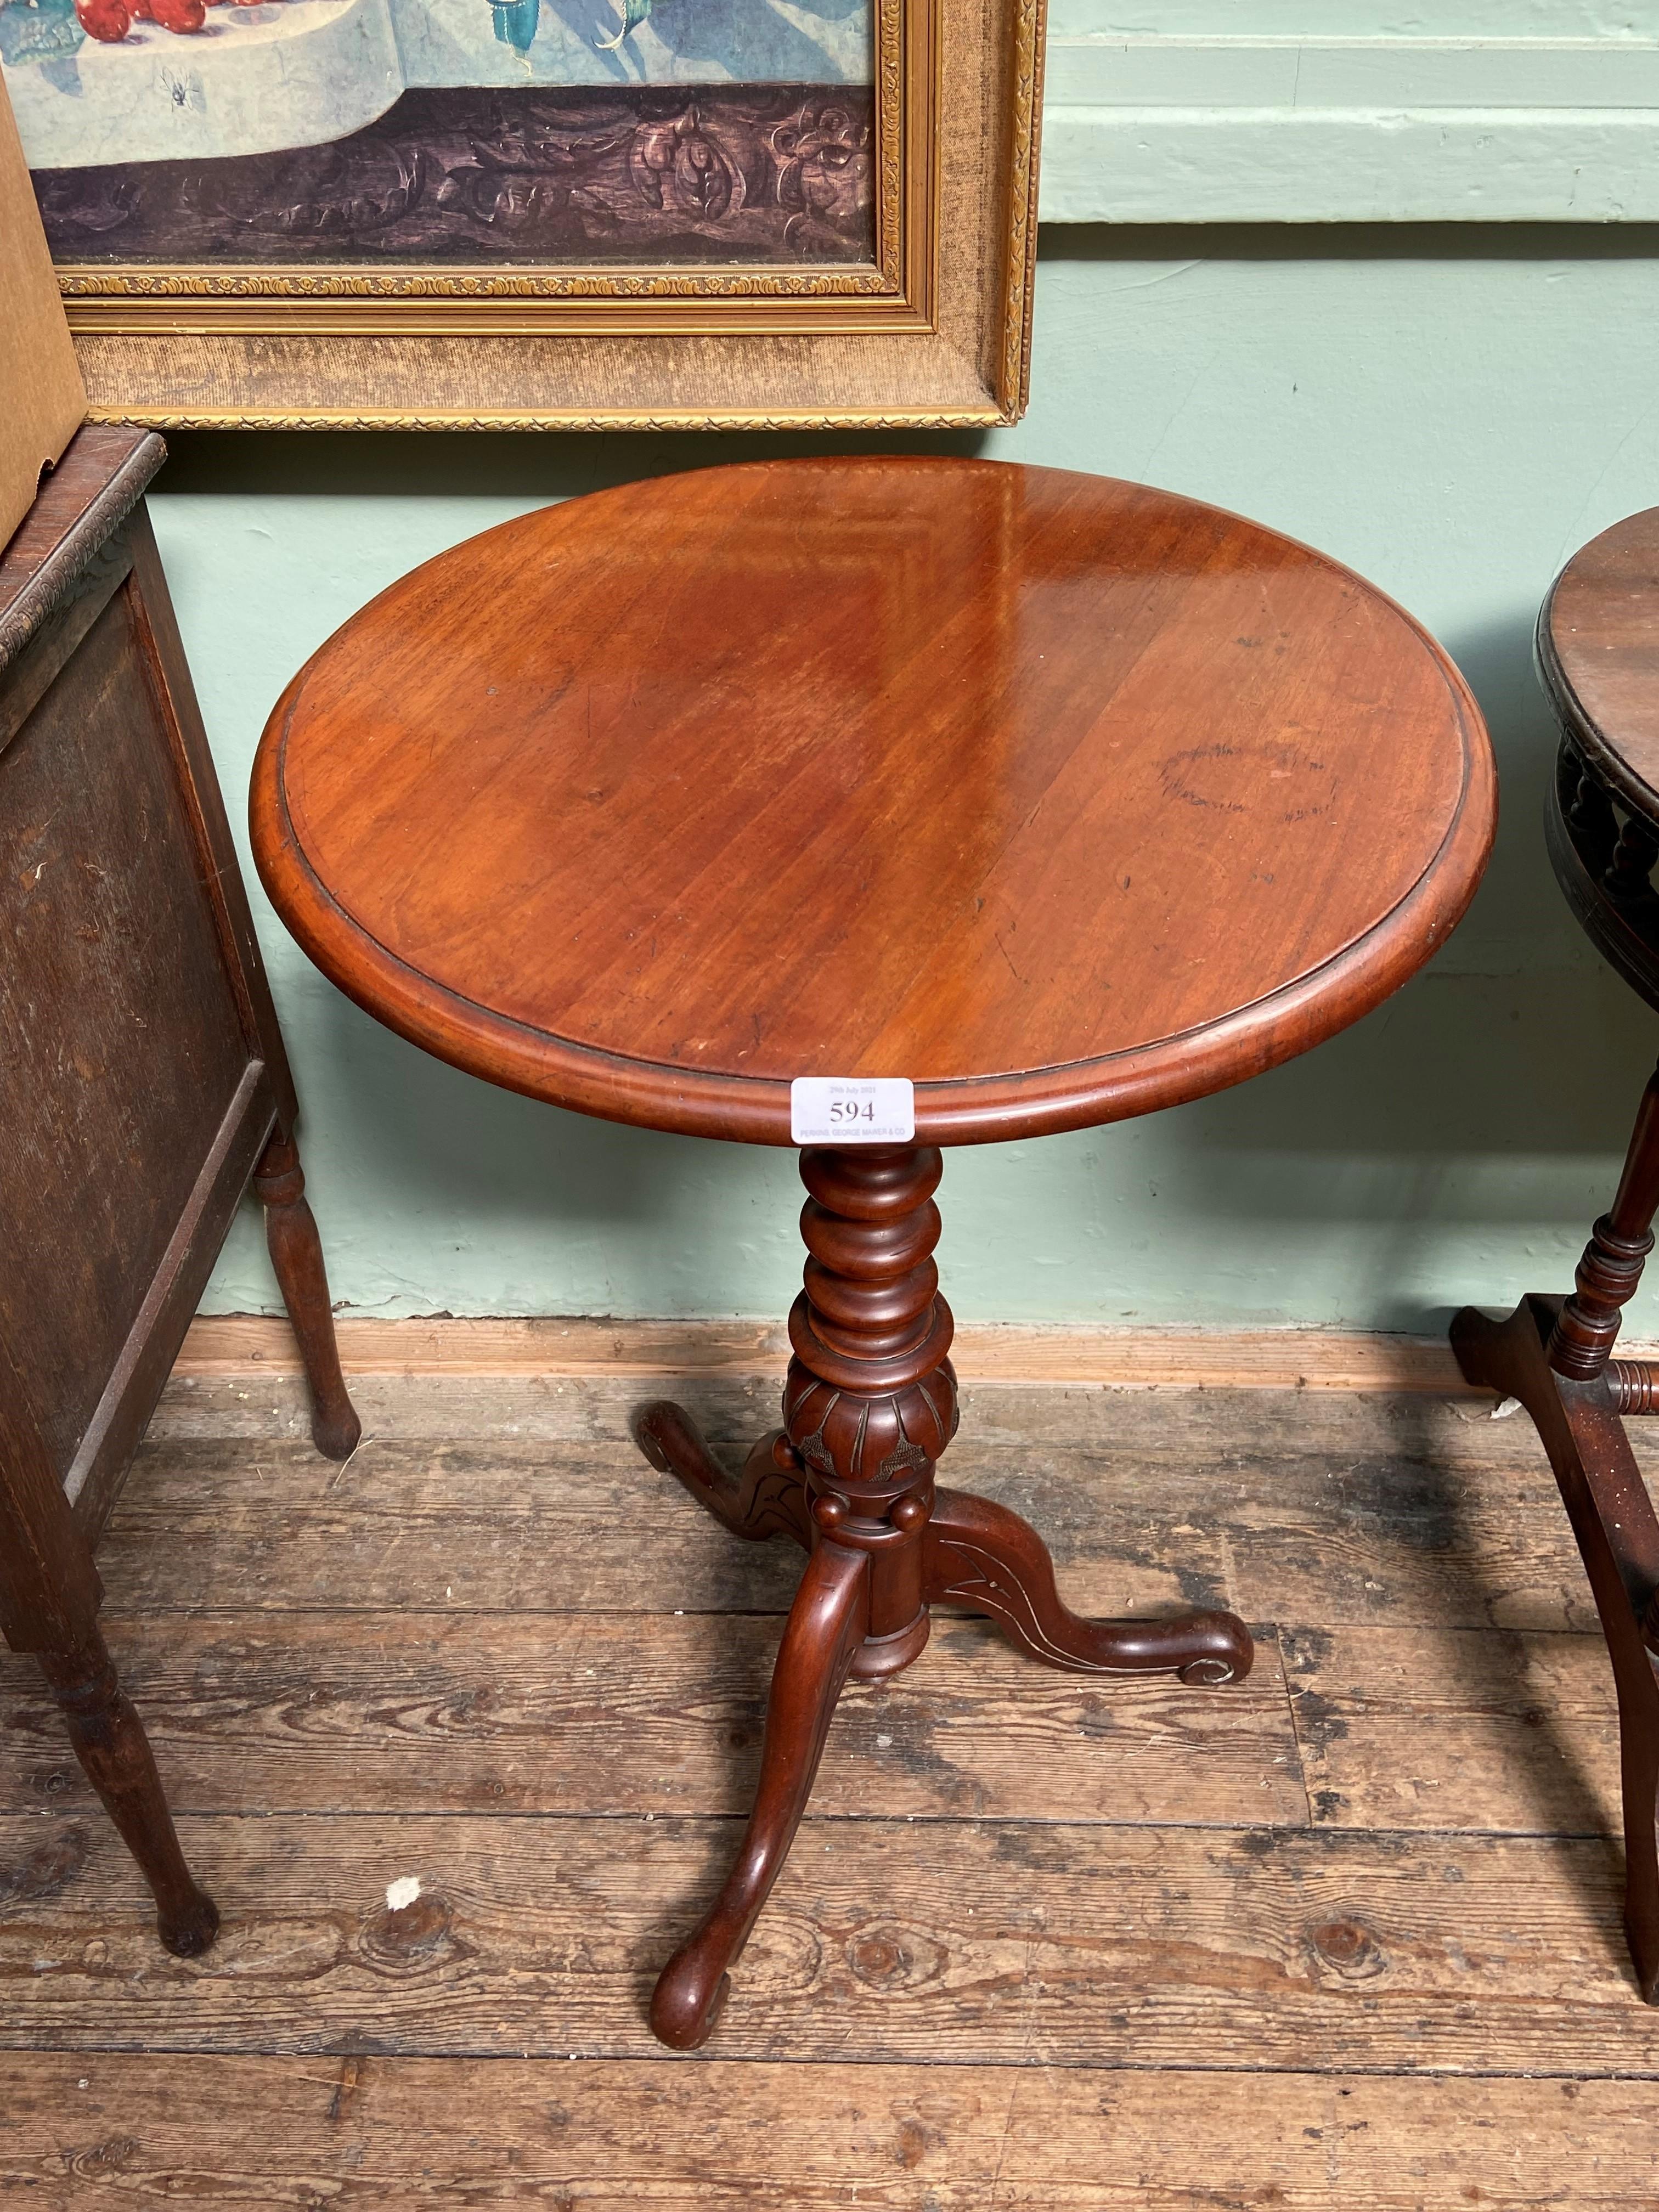 Mahogany circular topped side table on tricorn base